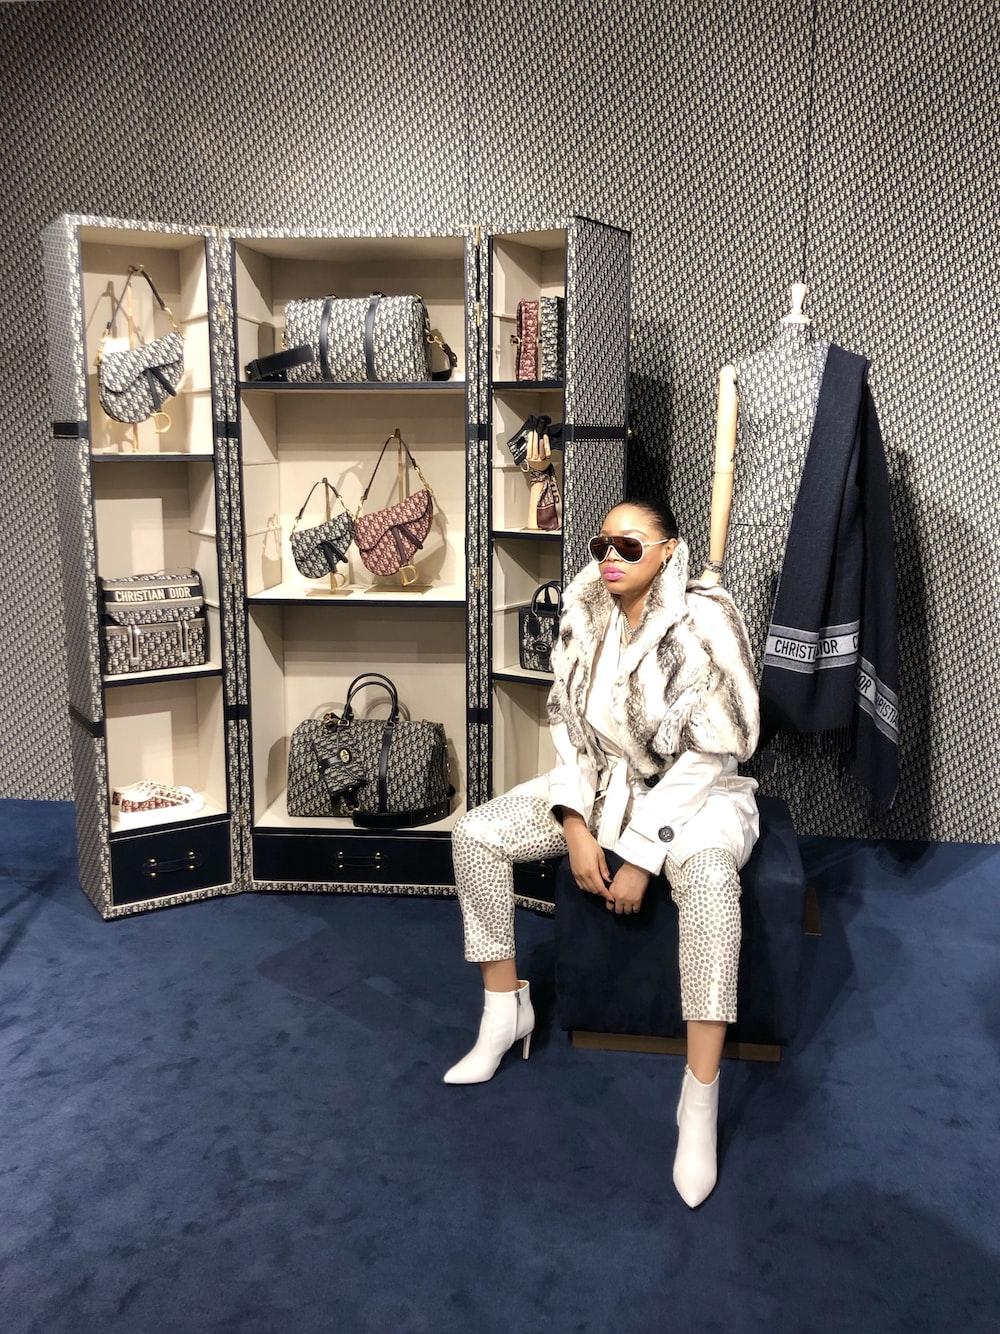 woman sitting on chair near open cabinet